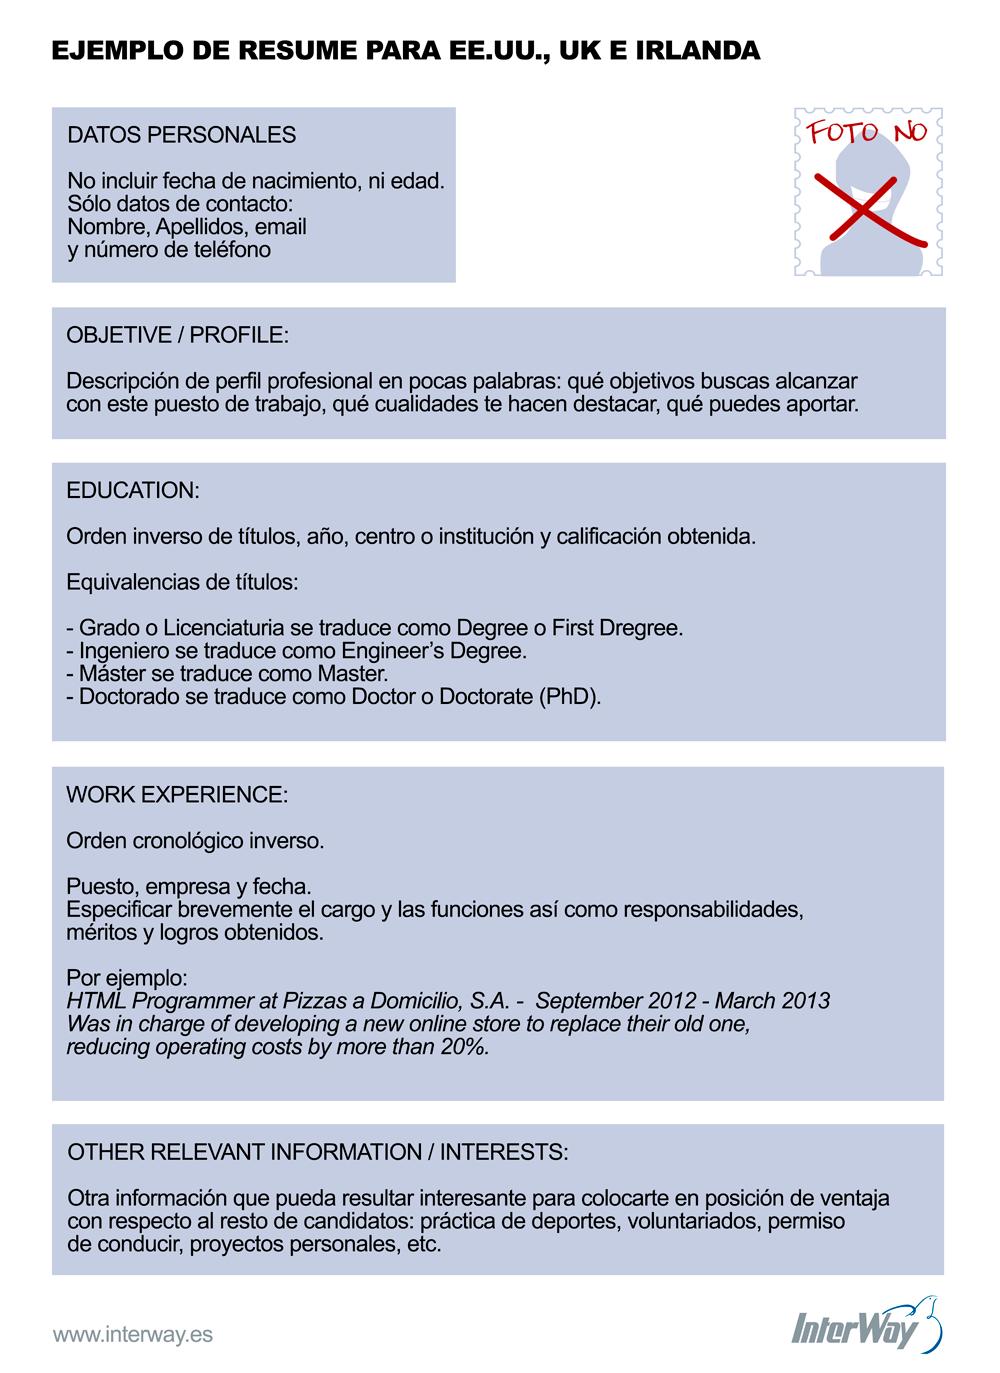 Curriculum en inglés para trabajar en USA - UK - Irlanda ...